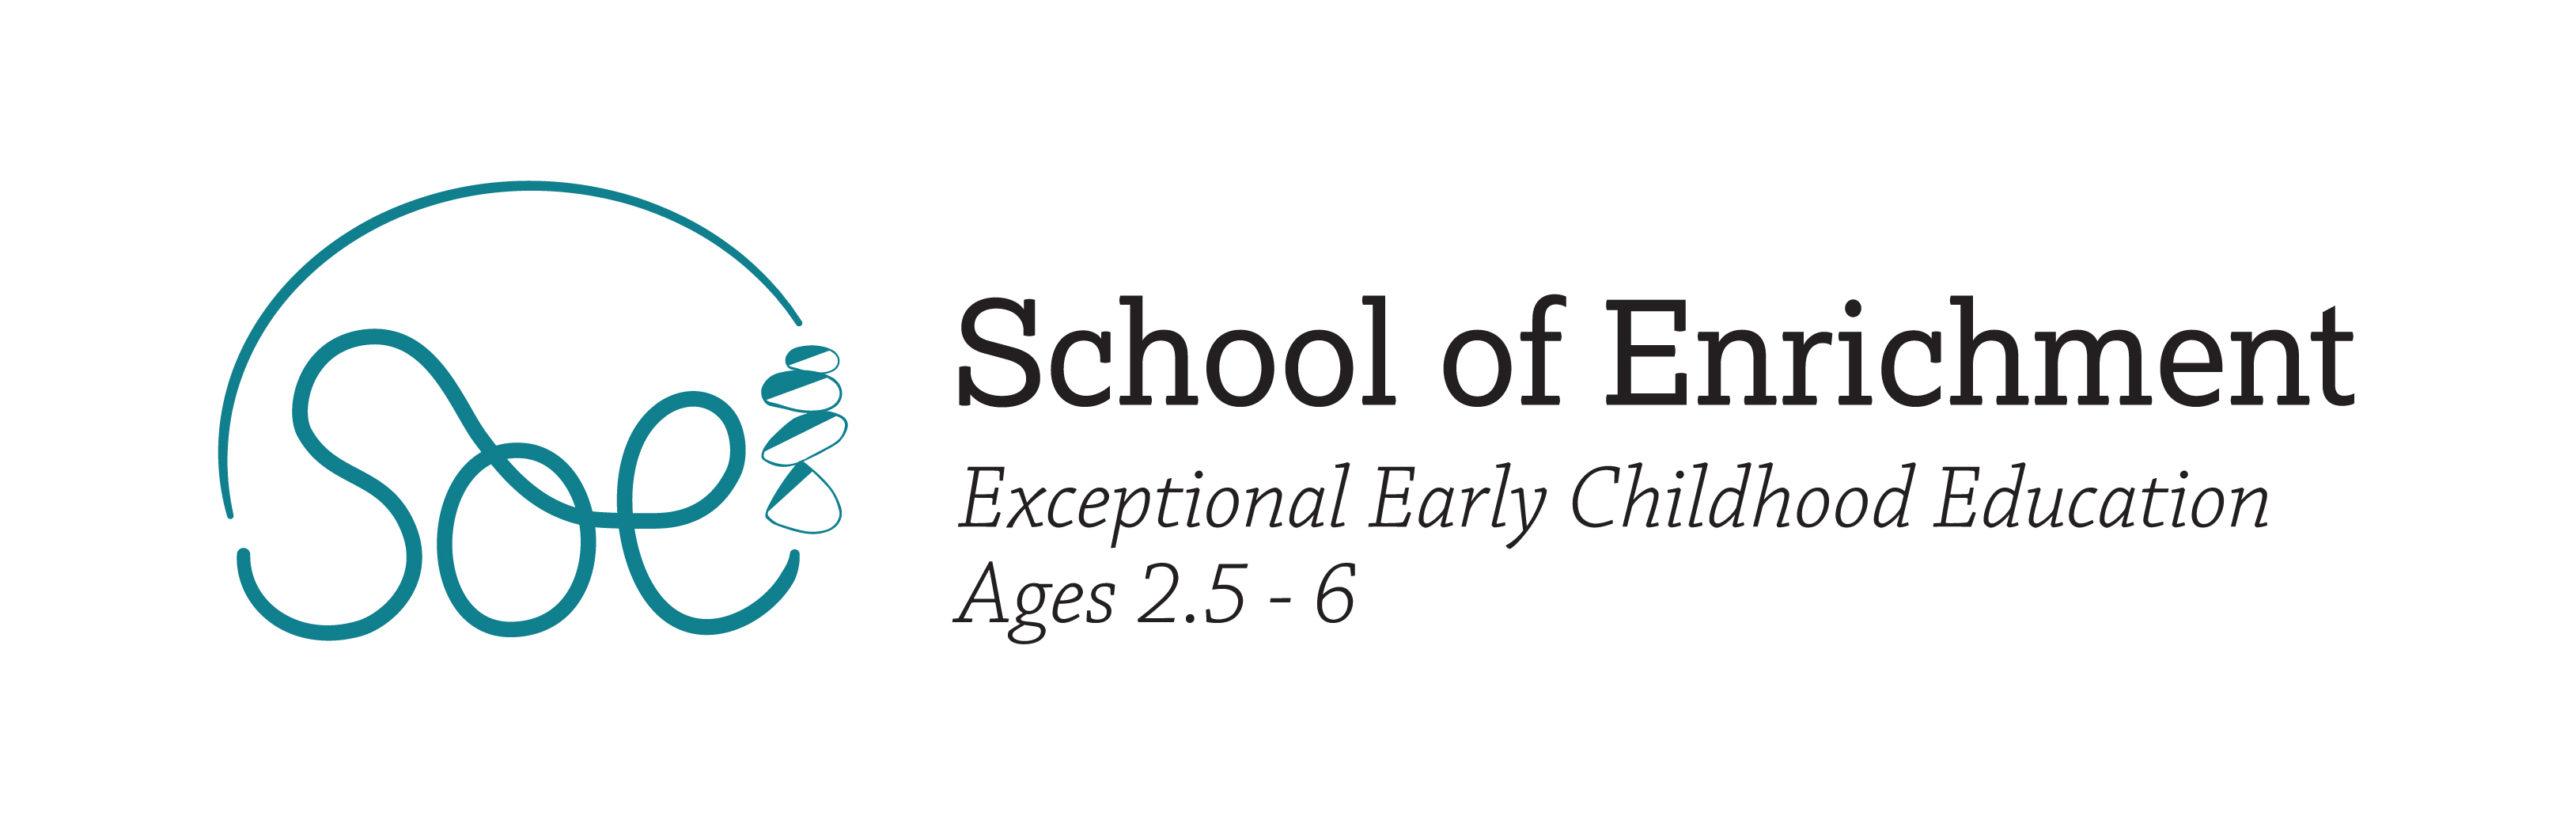 School of Enrichment